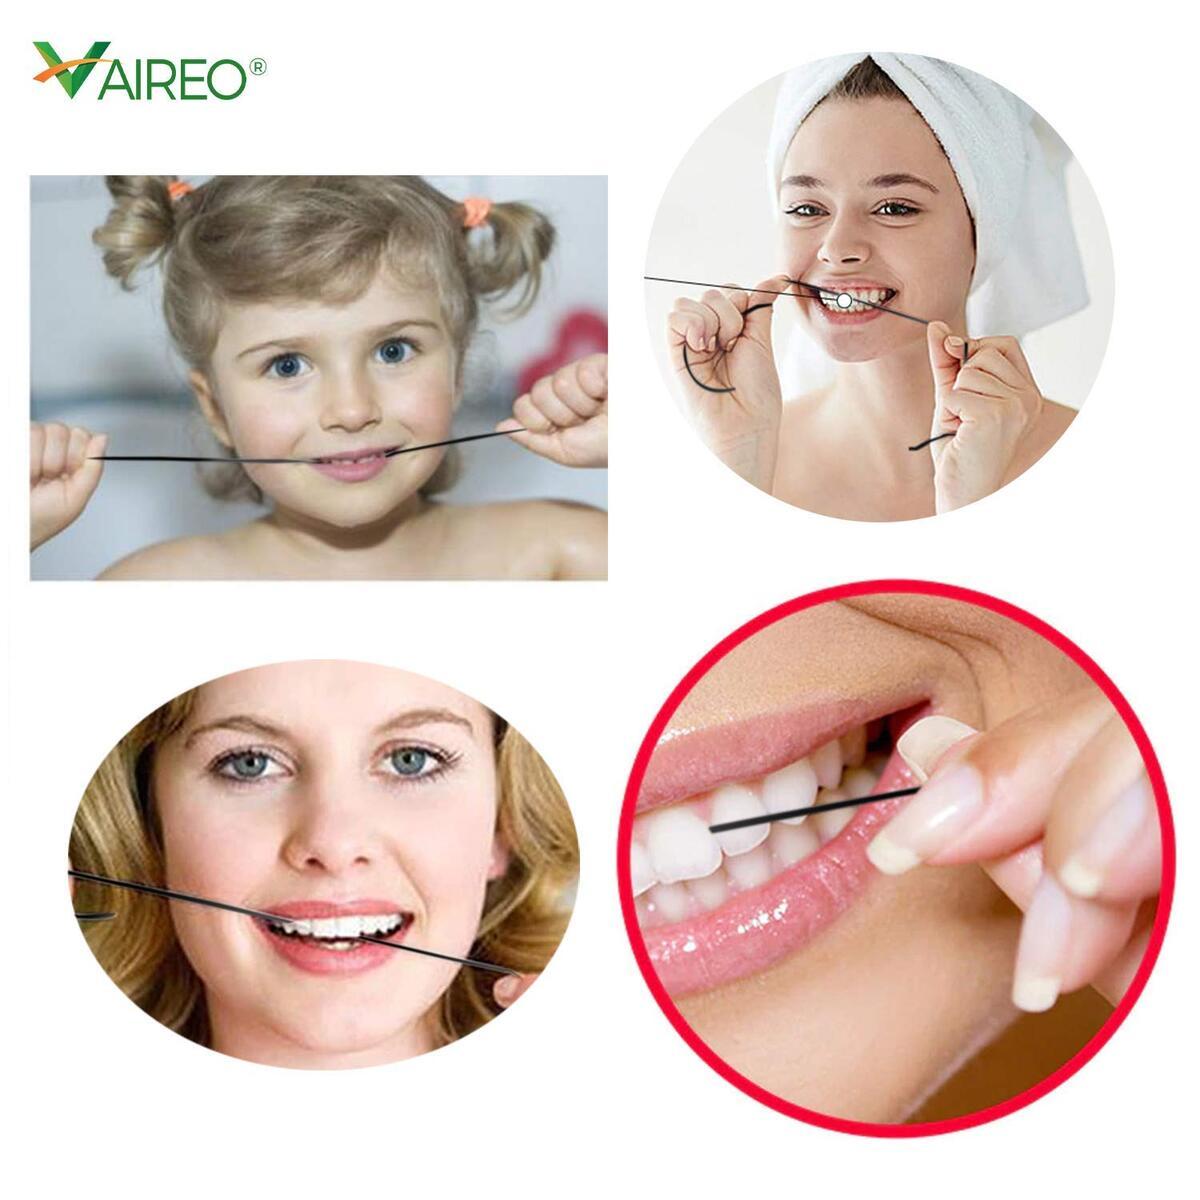 Bamboo Charcoal Silk Fiber Thread Floss - 100% Natural Organic Biodegradable Zero Waste Flossing for Teeth